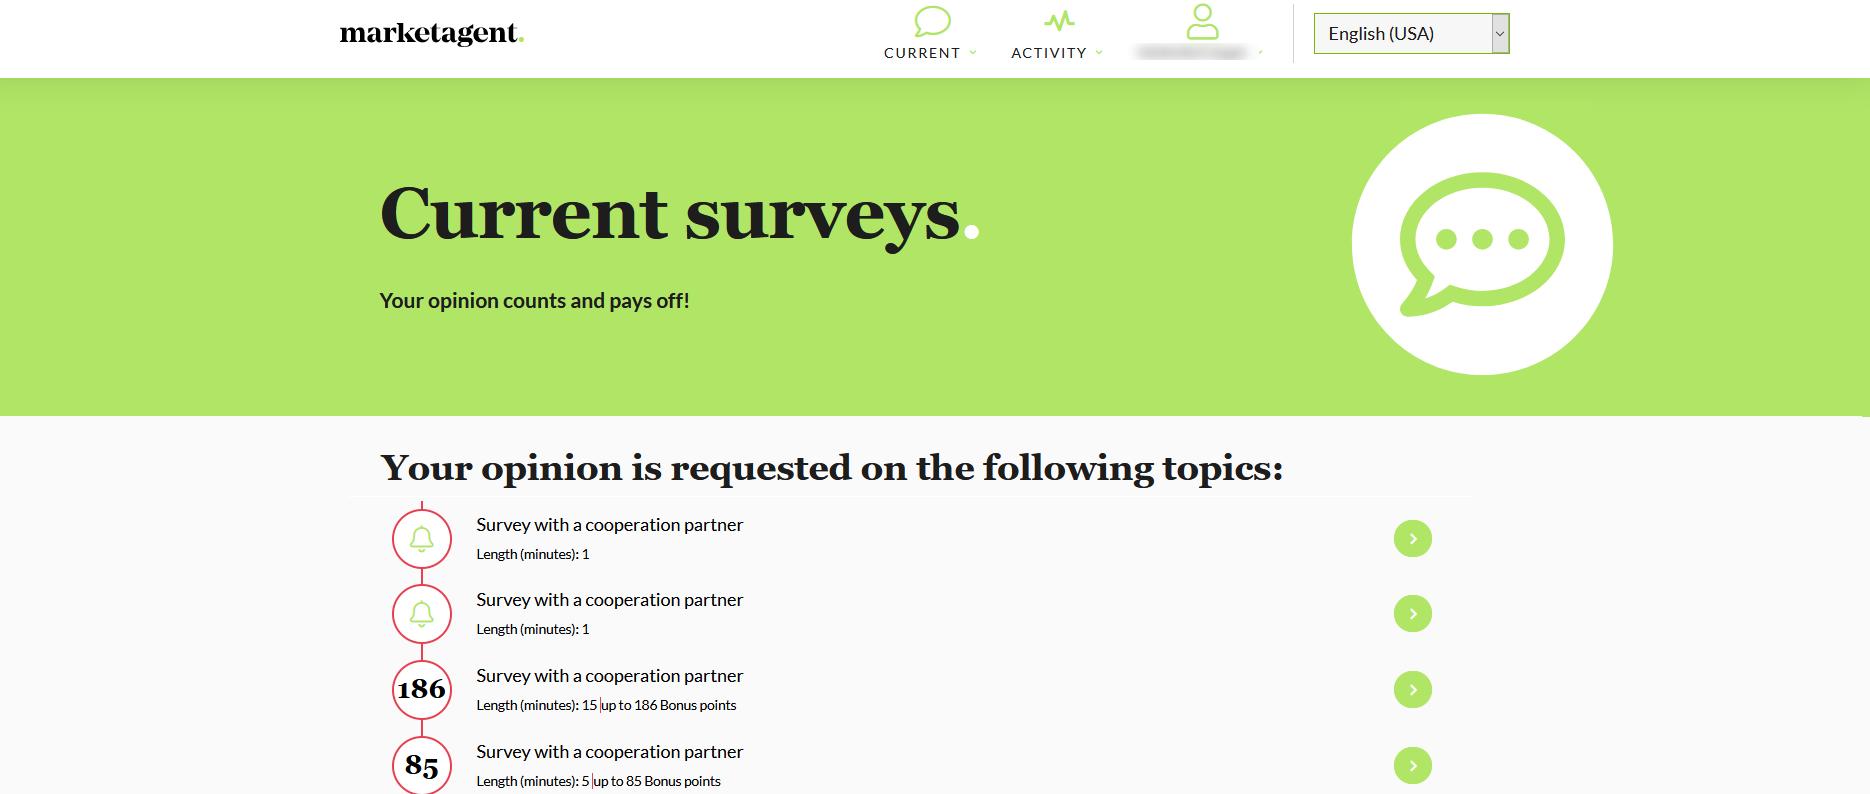 marketagent website